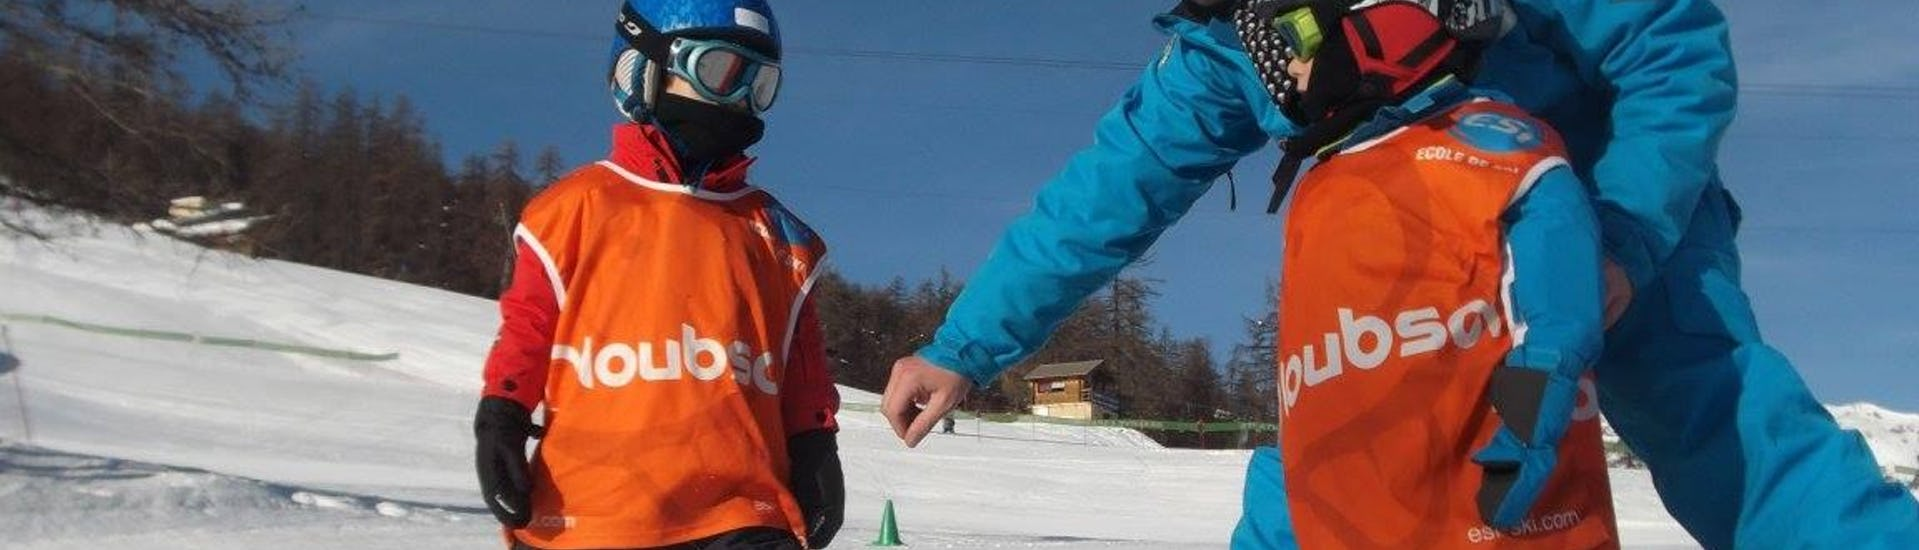 Kids Ski Lessons (4-8 years) - February - 1st Timer